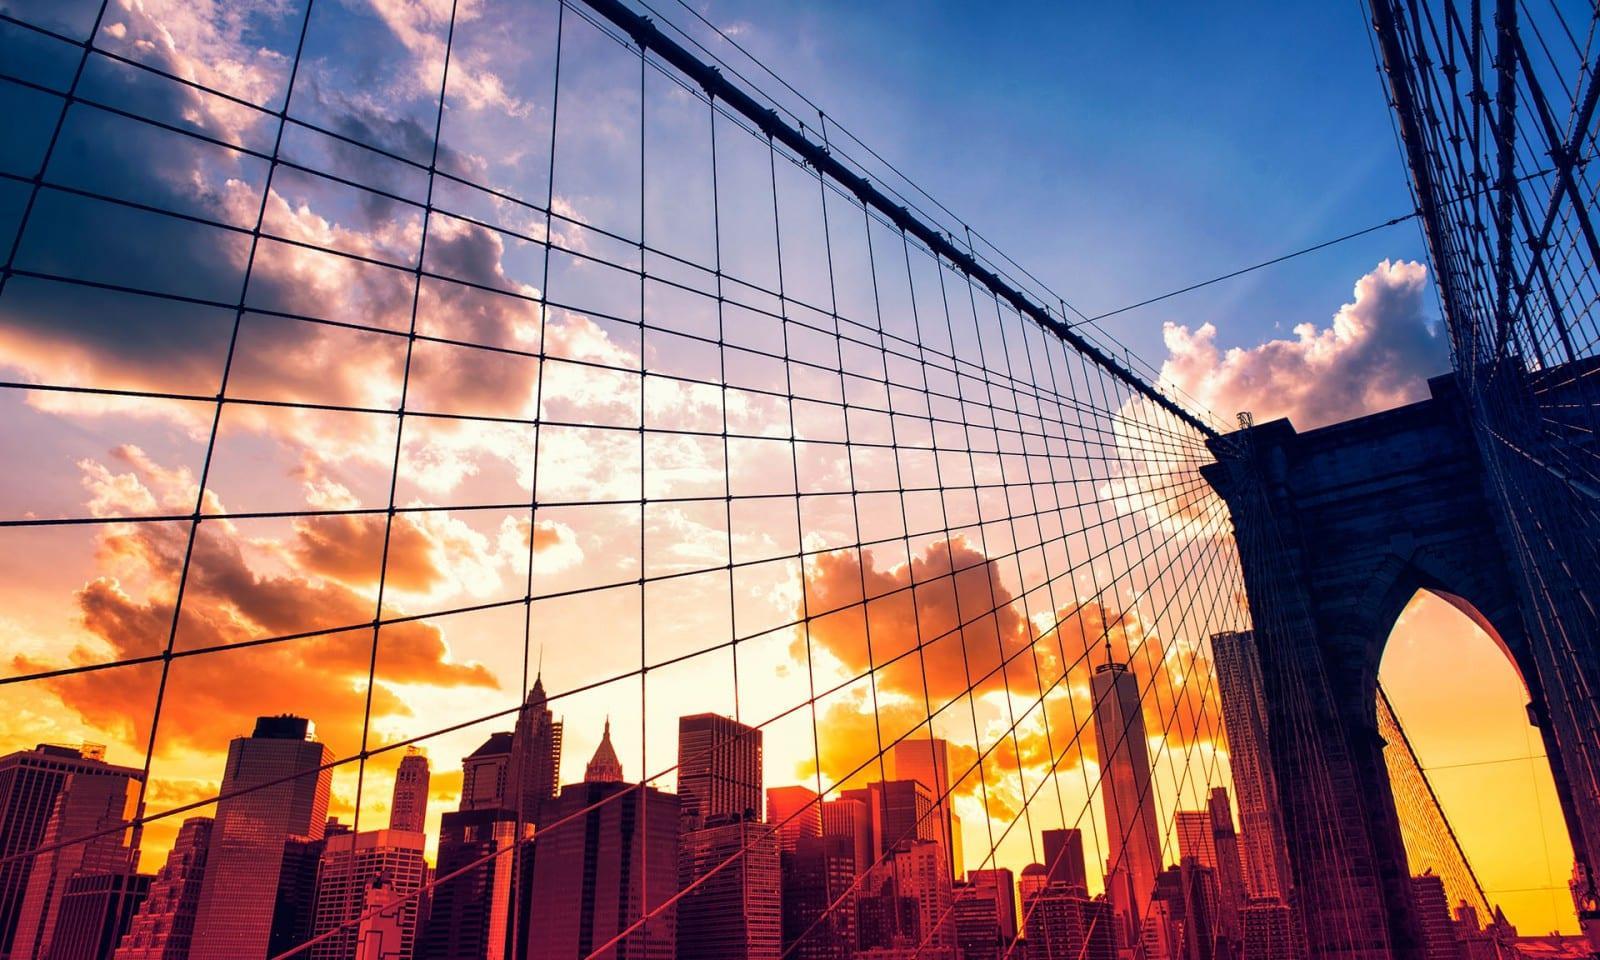 Dollarphotoclub_74965974-Brooklyn-Bridge-1600x960